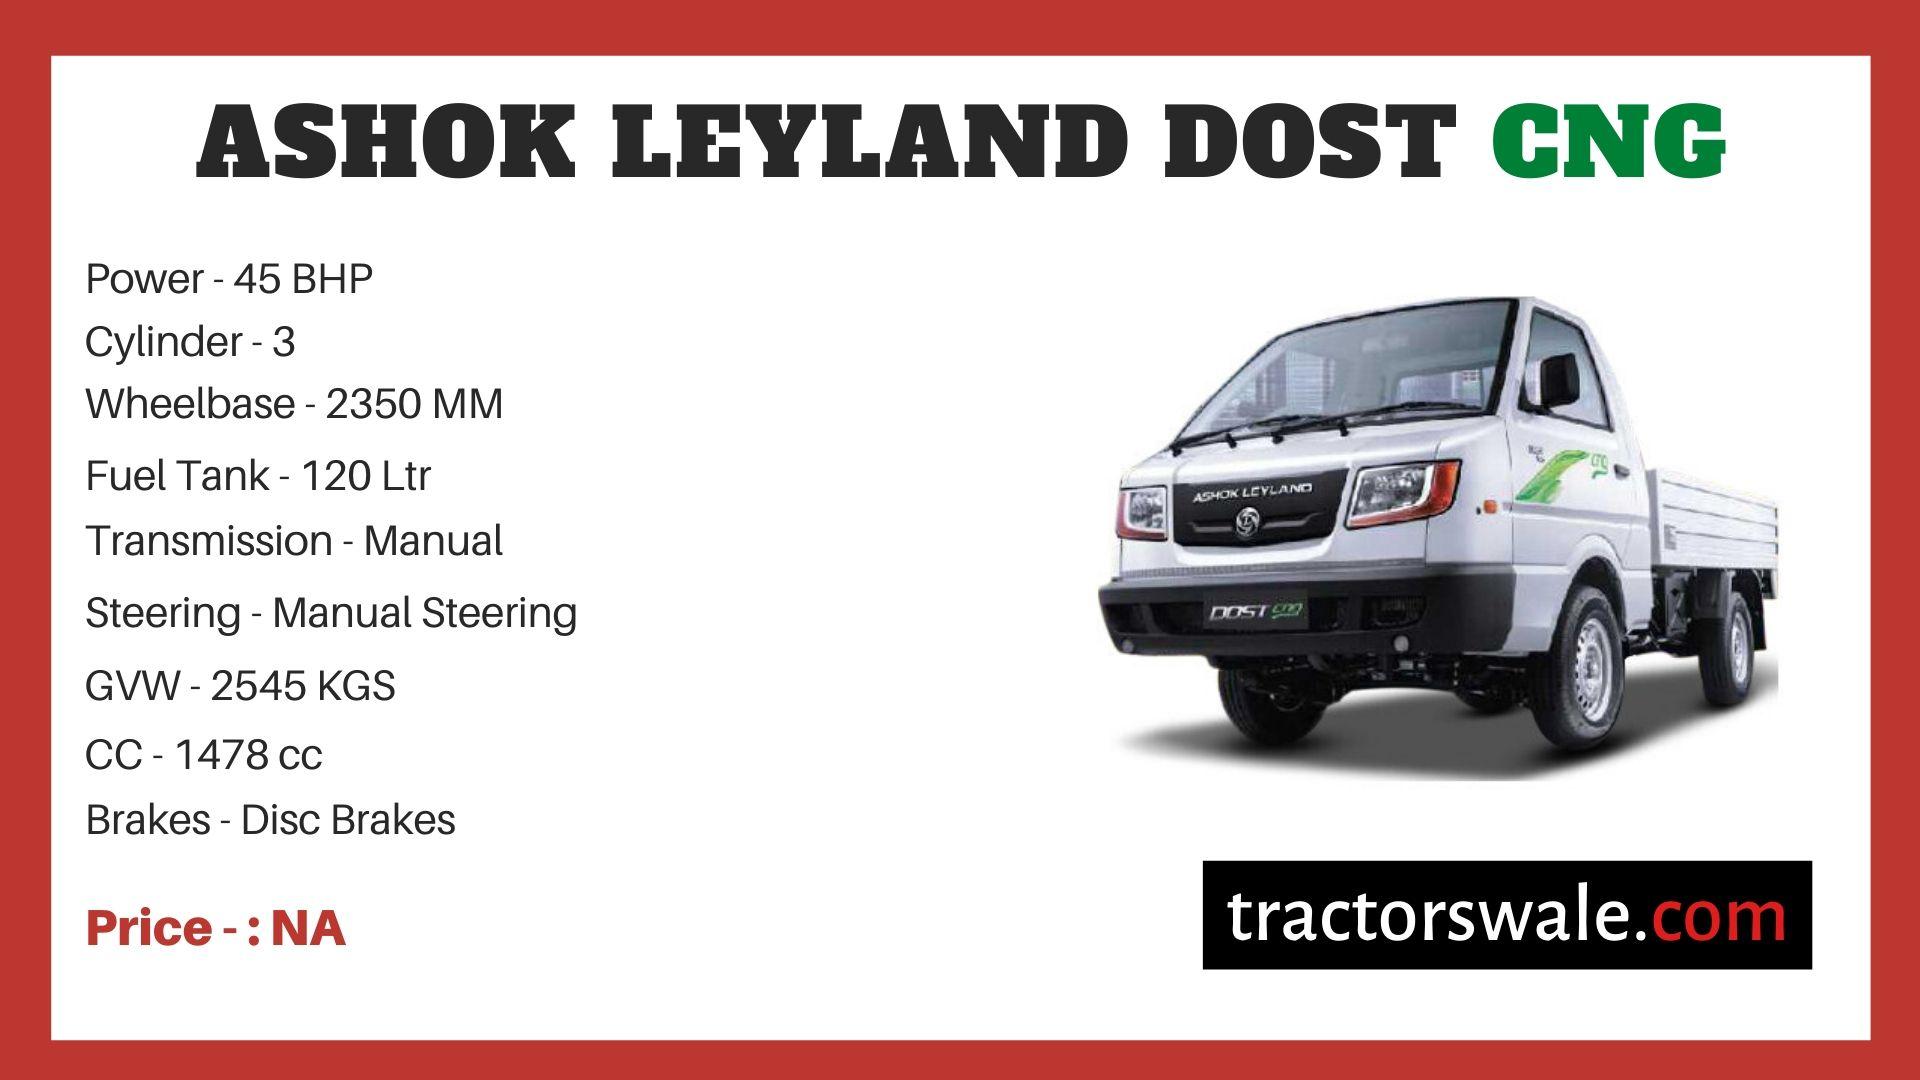 Ashok Leyland DOST CNG price